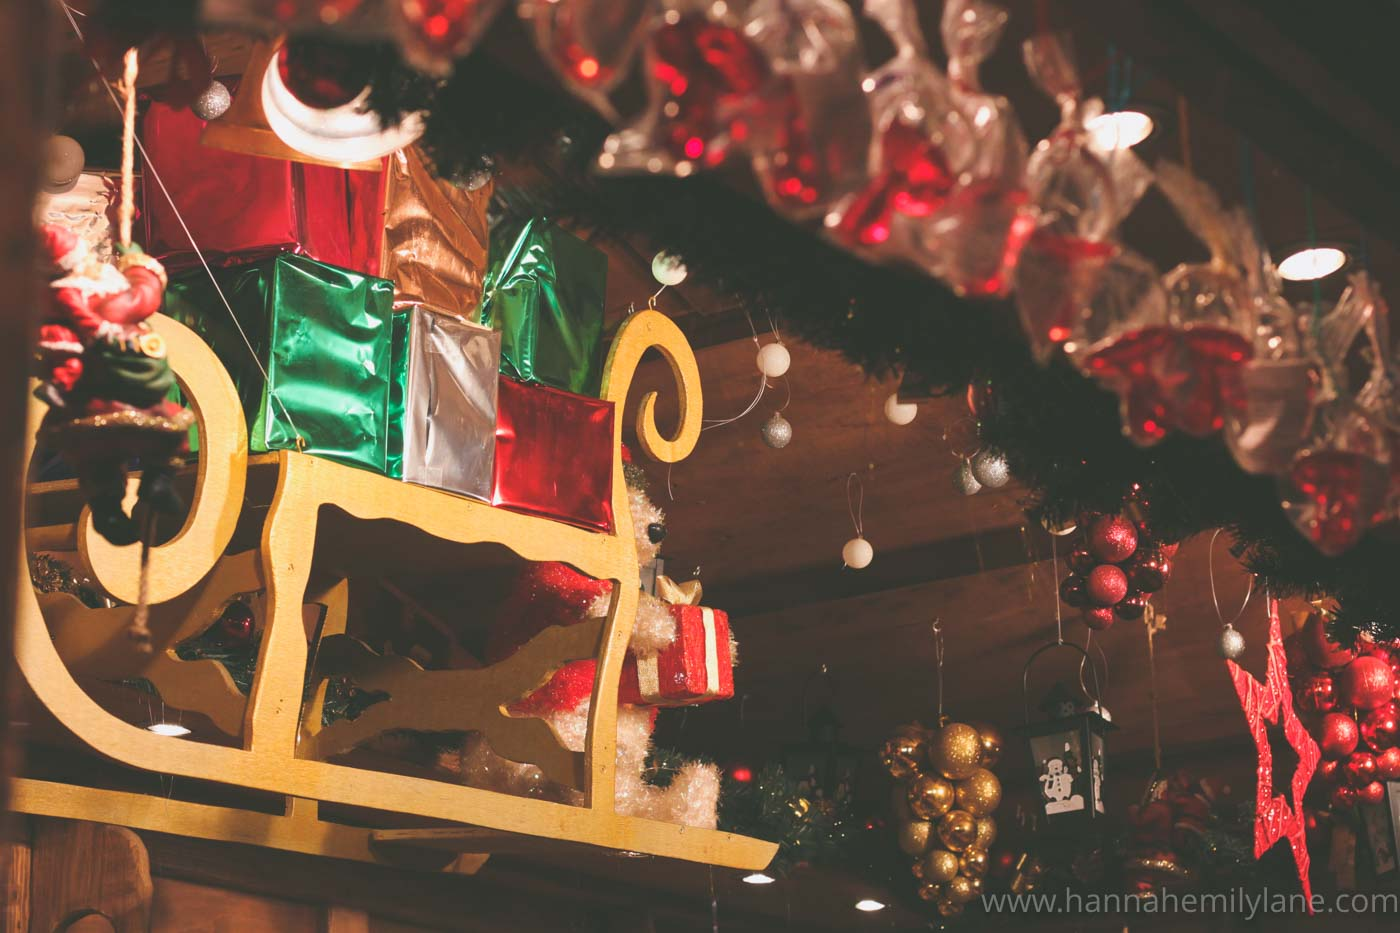 Birmingham Christmas Markets | www.hannahemilylane.com-14.jpg